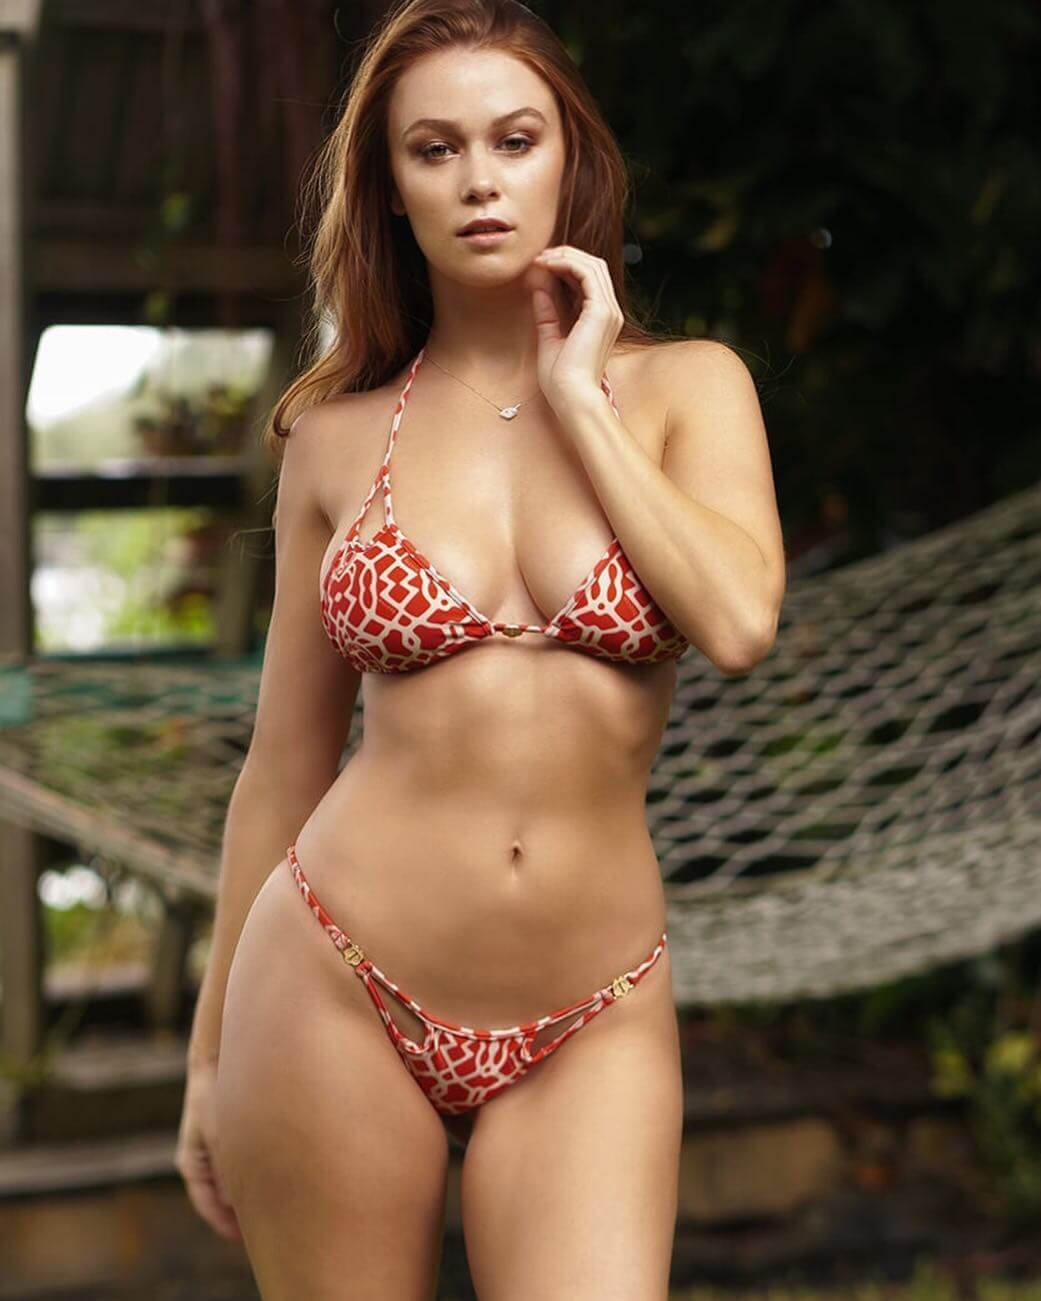 Leanna Decker hot bikini pic